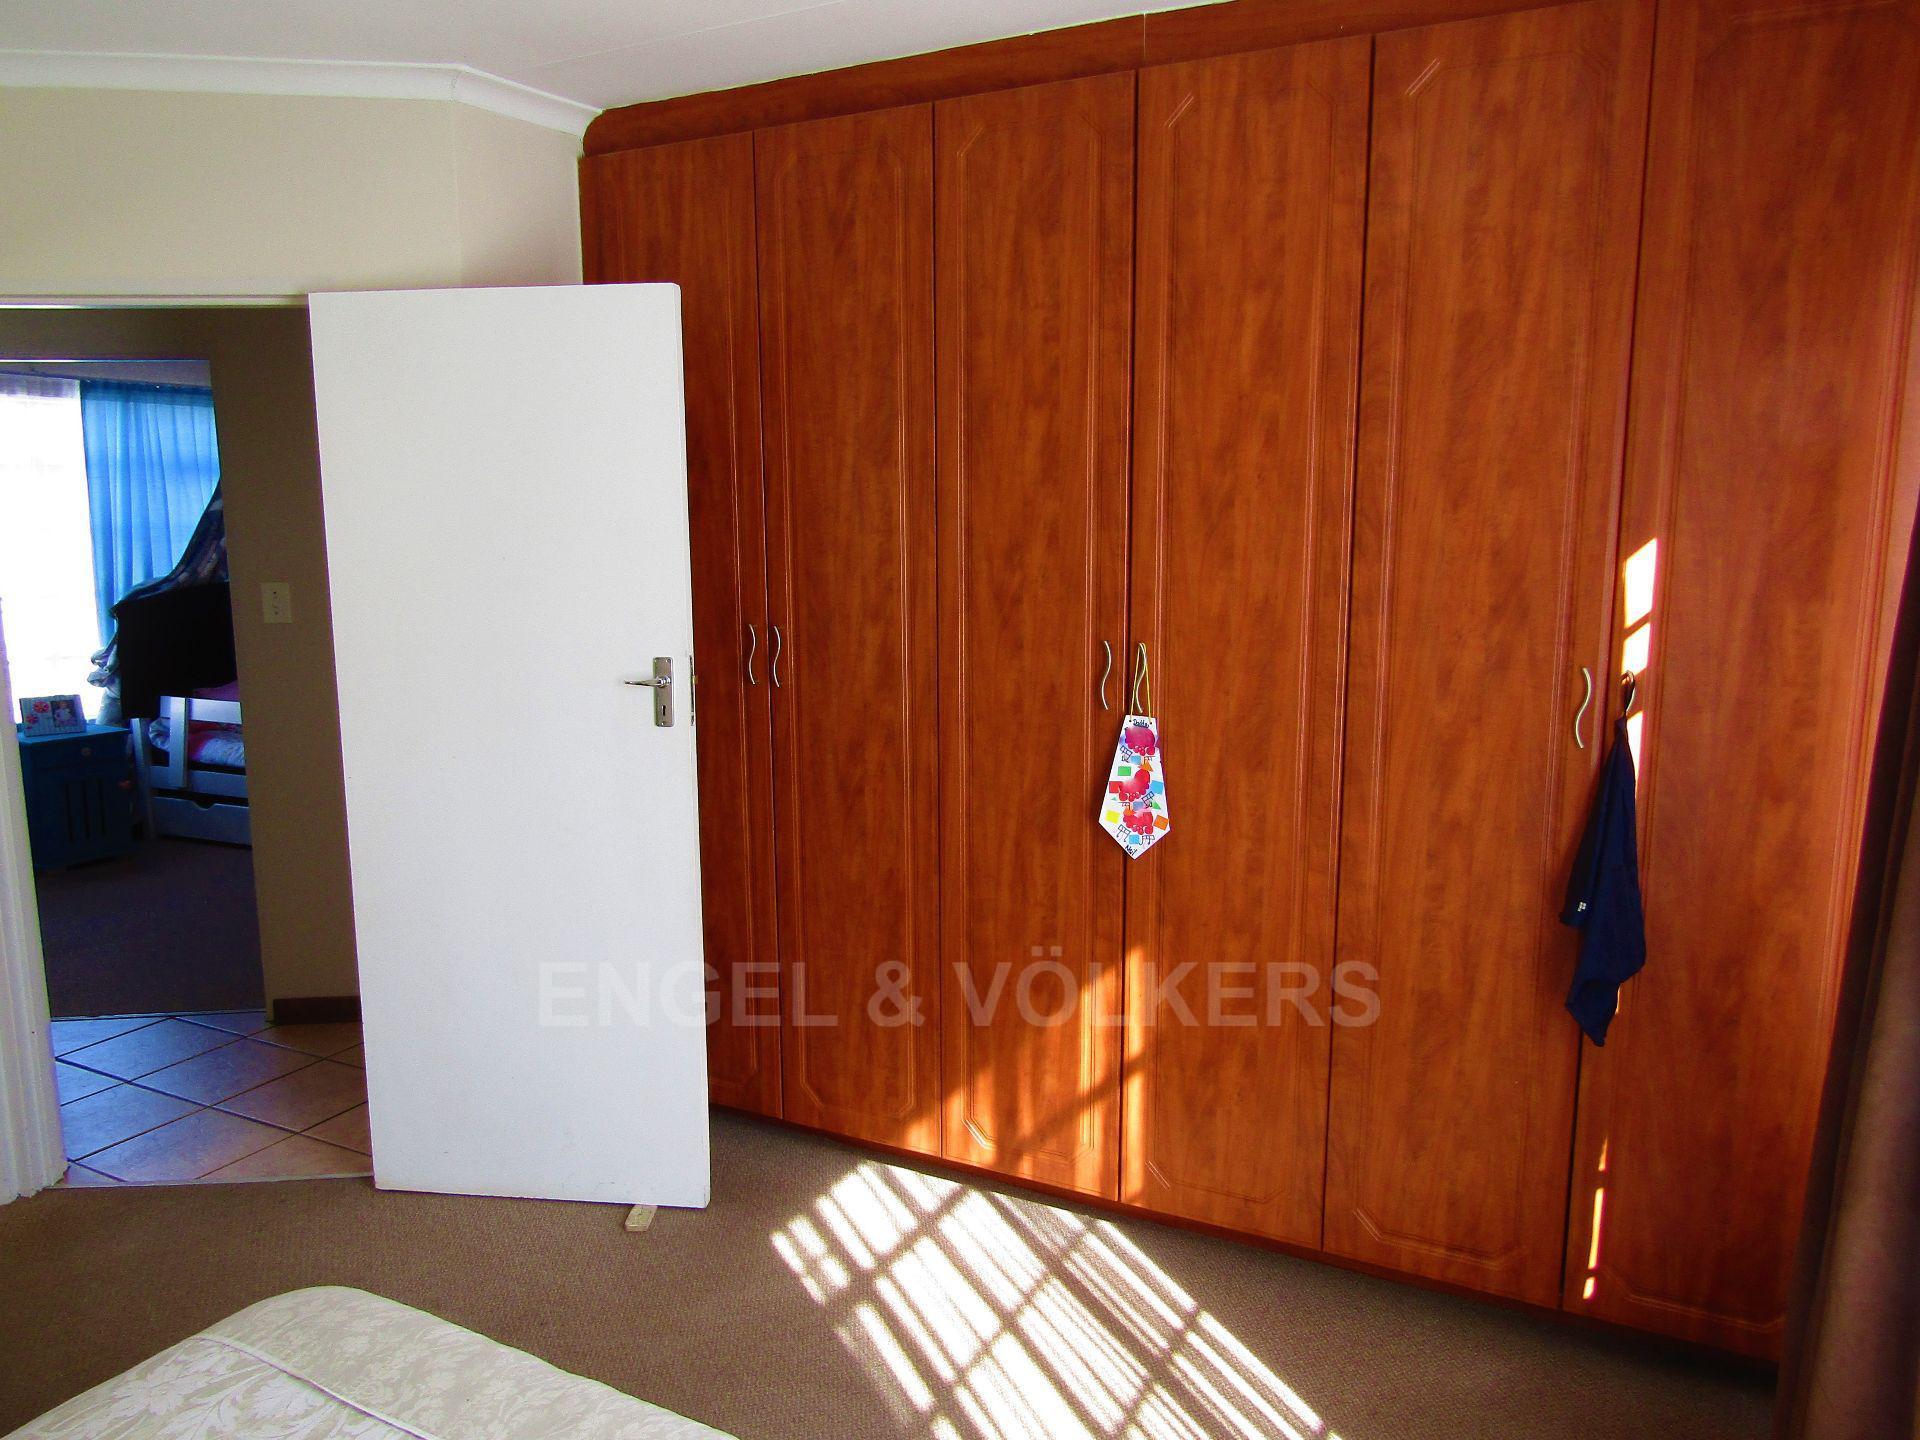 Baillie Park property for sale. Ref No: 13520599. Picture no 10